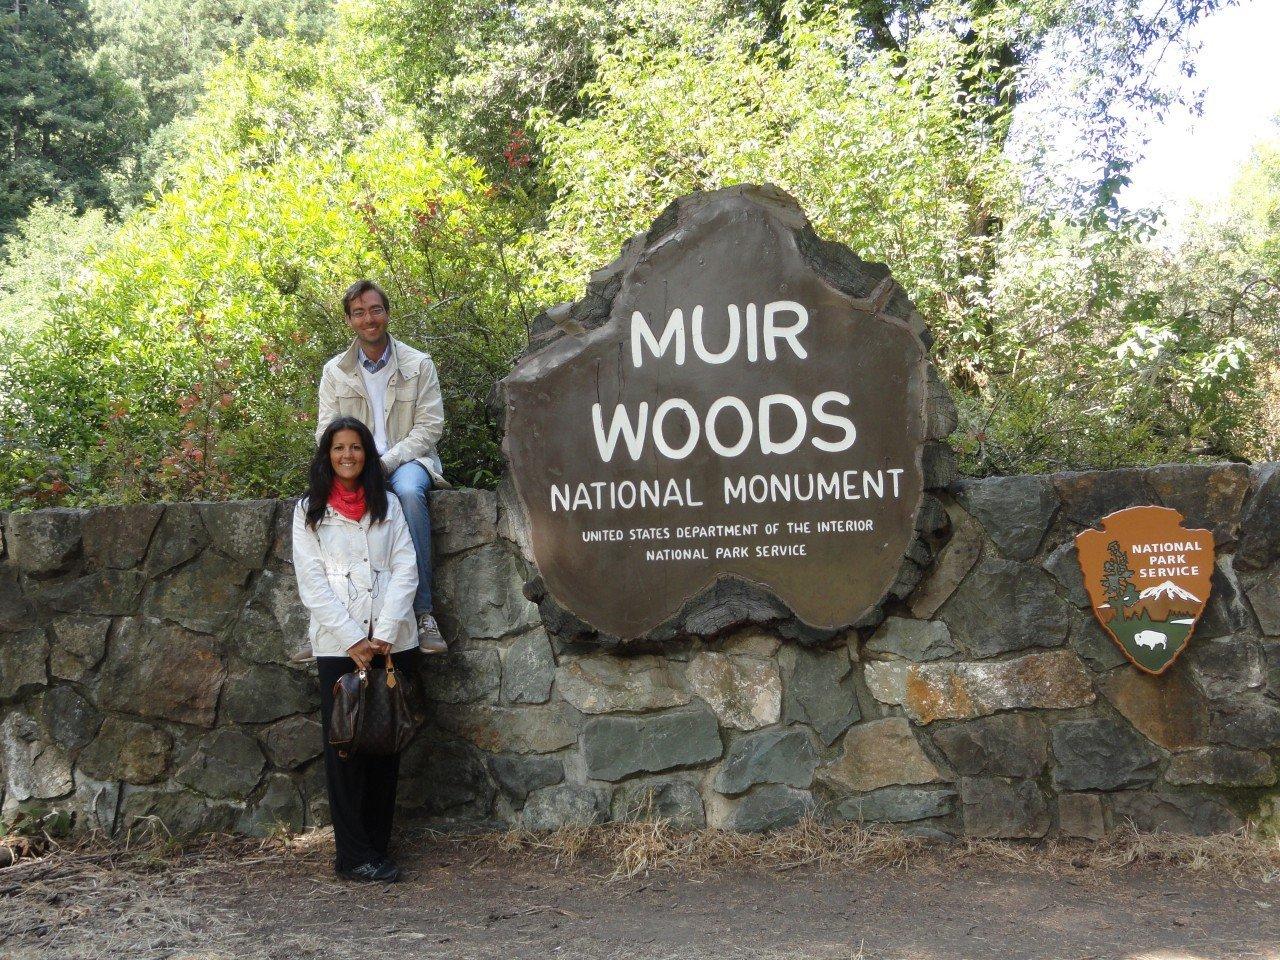 tour parchi americani, muir woods,